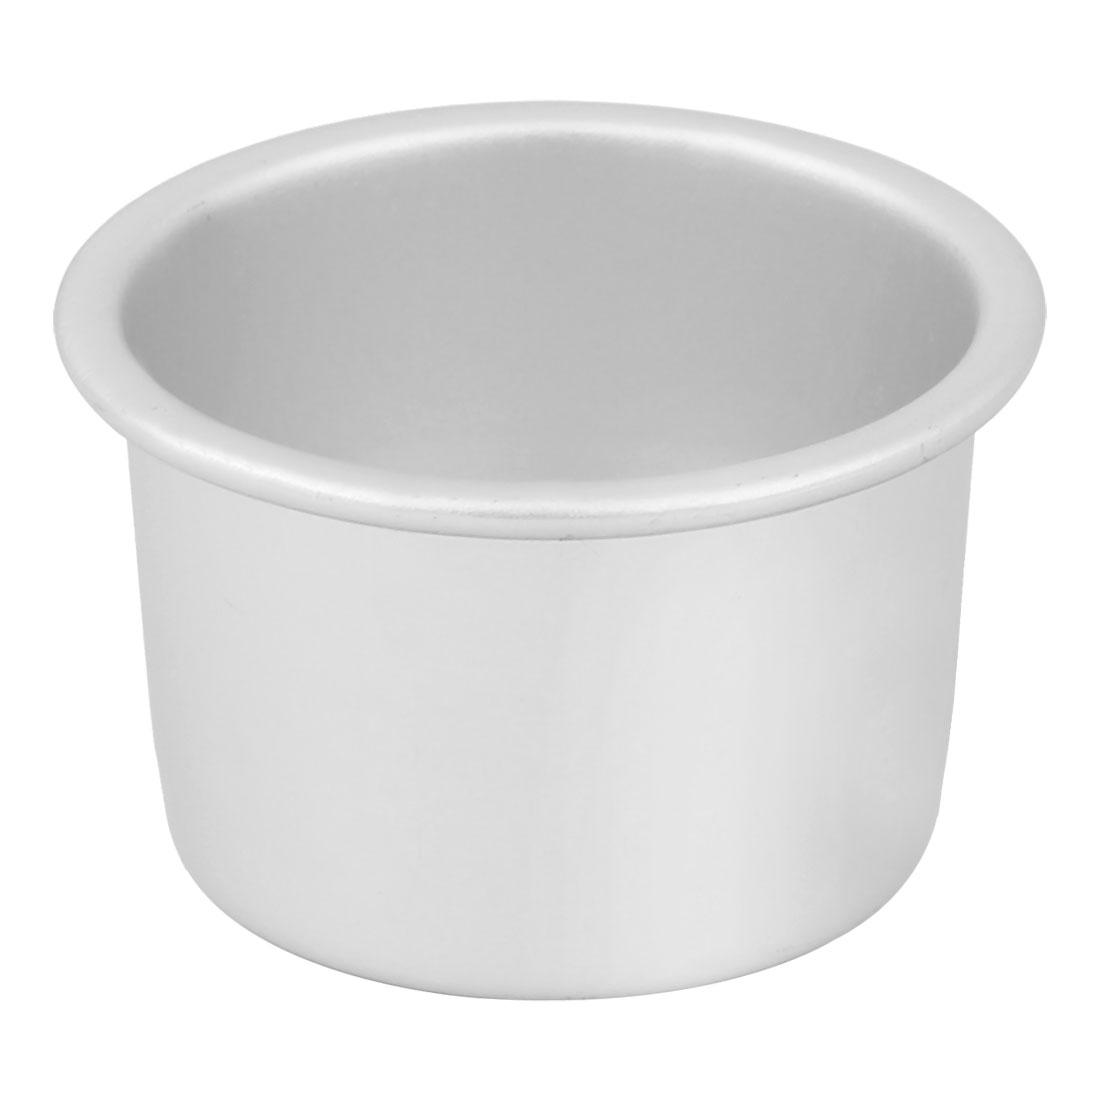 Aluminum Alloy Removable Bottom Nonstick Bread Cake Mold Mould Pot Silver Tone